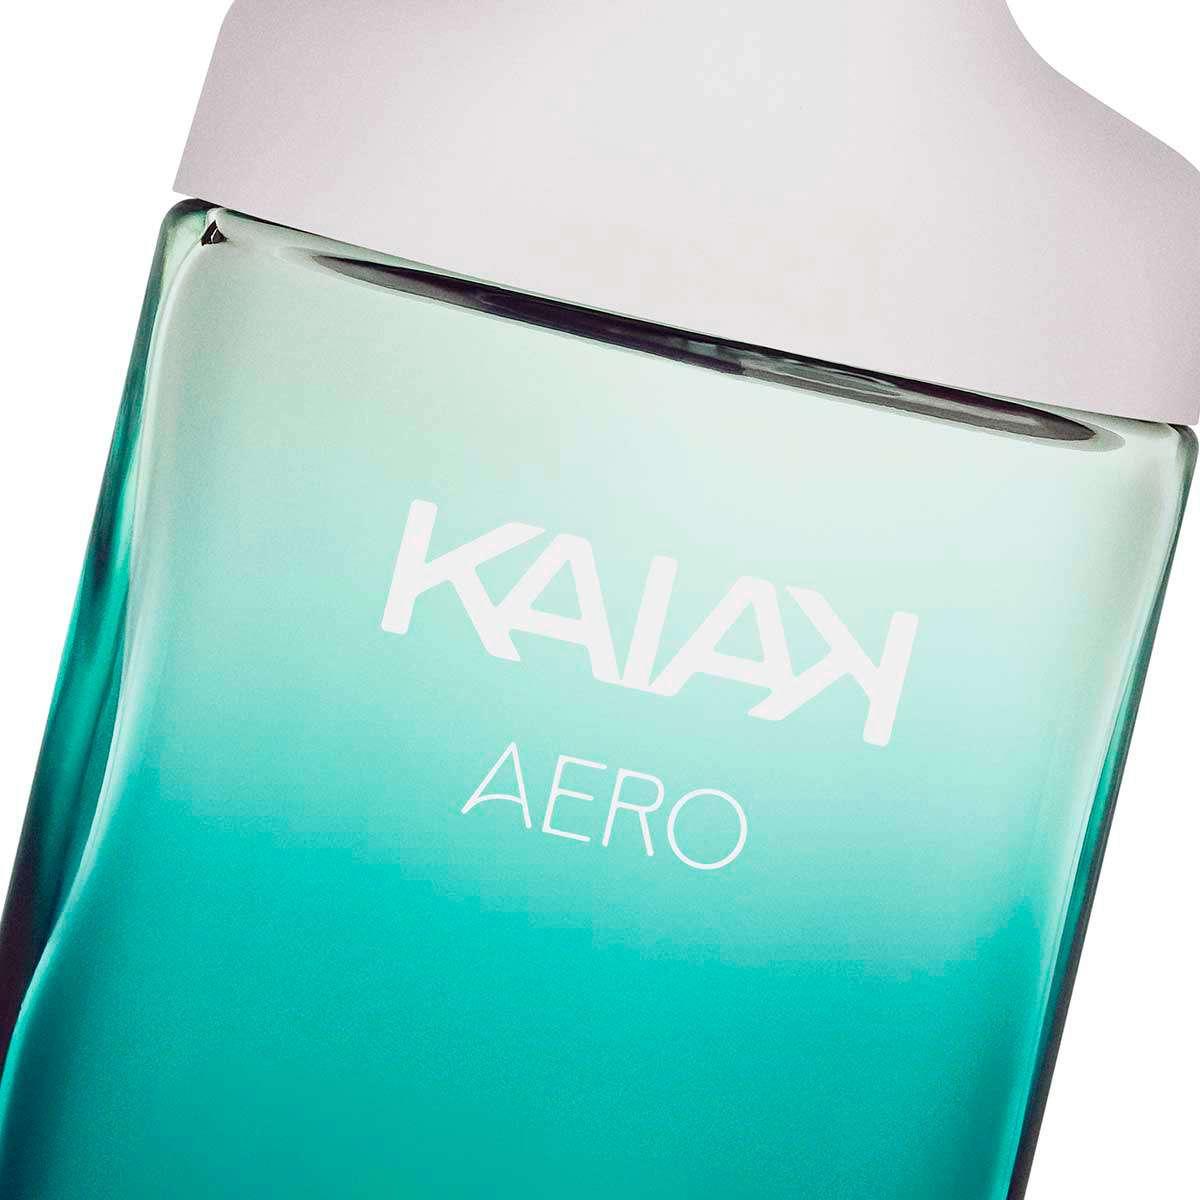 Natura Kaiak Aero Desodorante Colônia Masculino 100ml